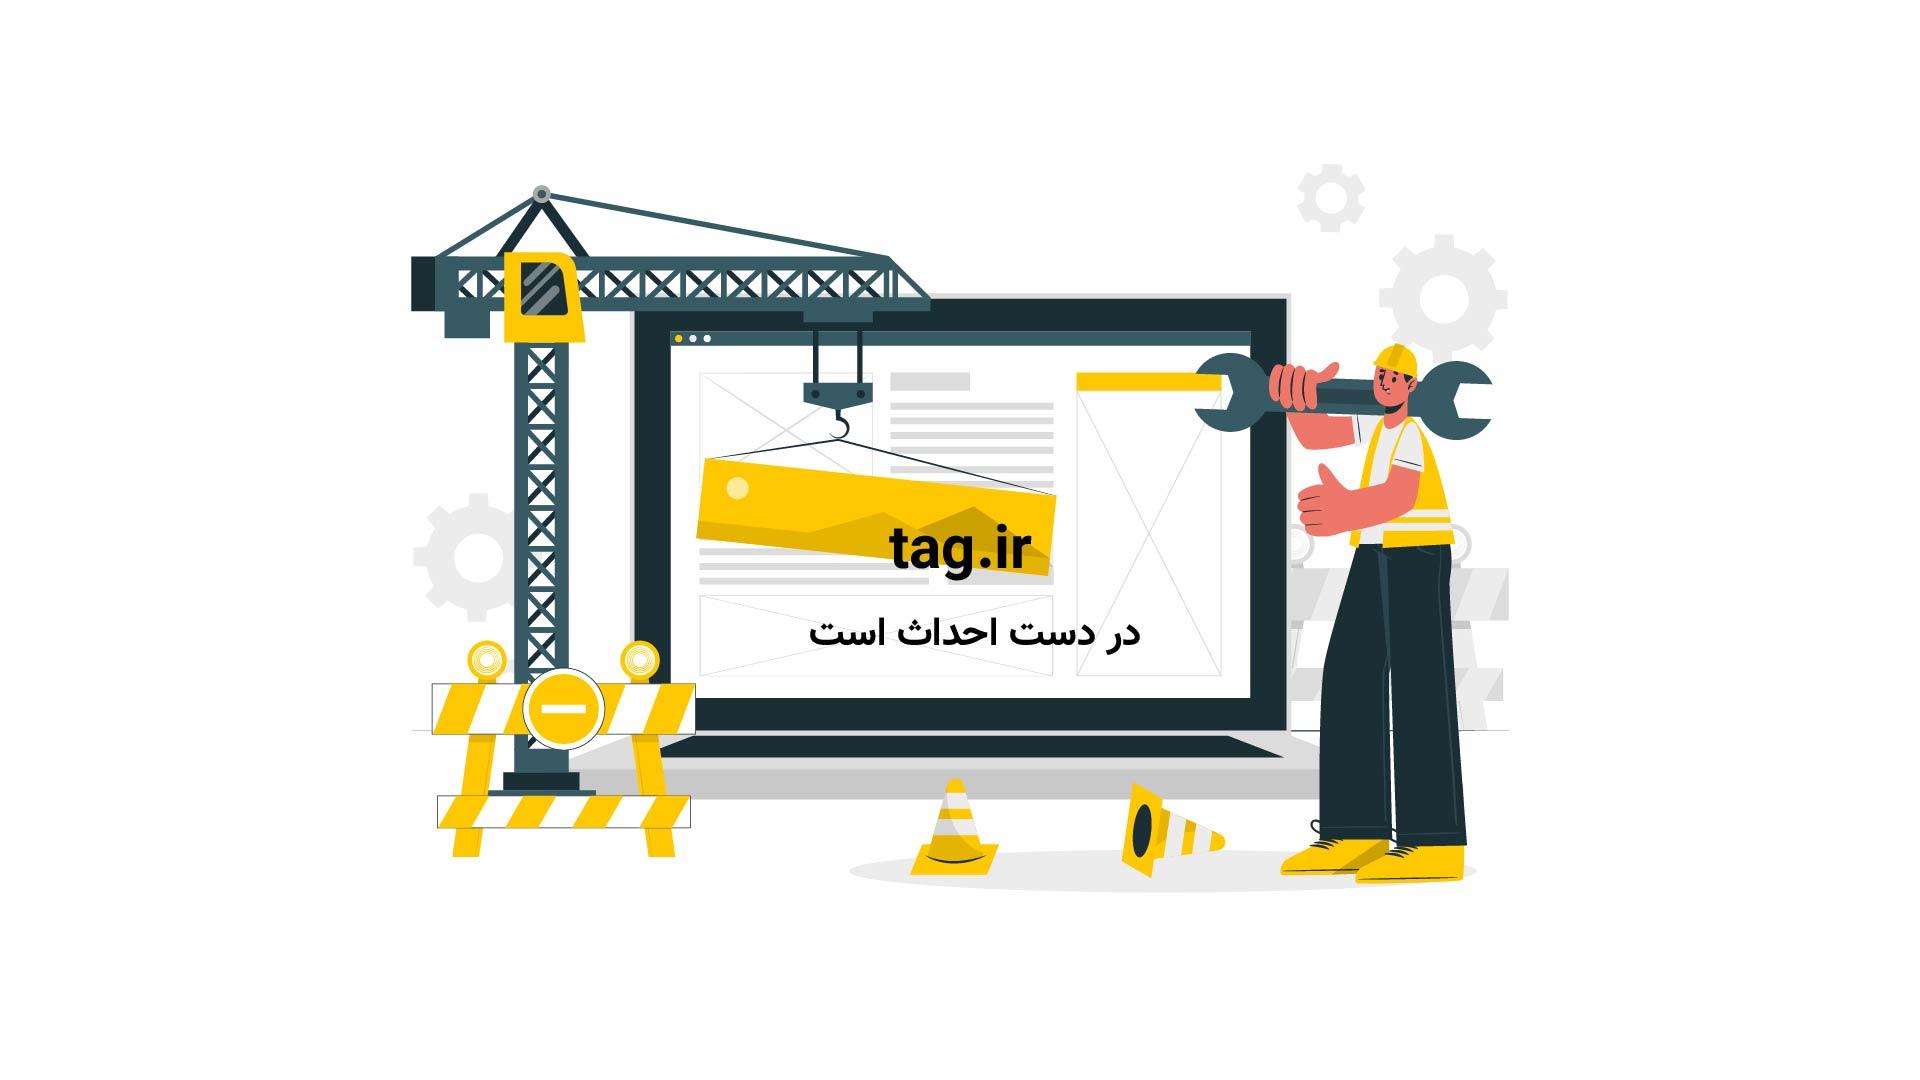 سخنرانیهای تد؛ شهری که نیم میلیون کیلوگرم وزن کم کرد | فیلم